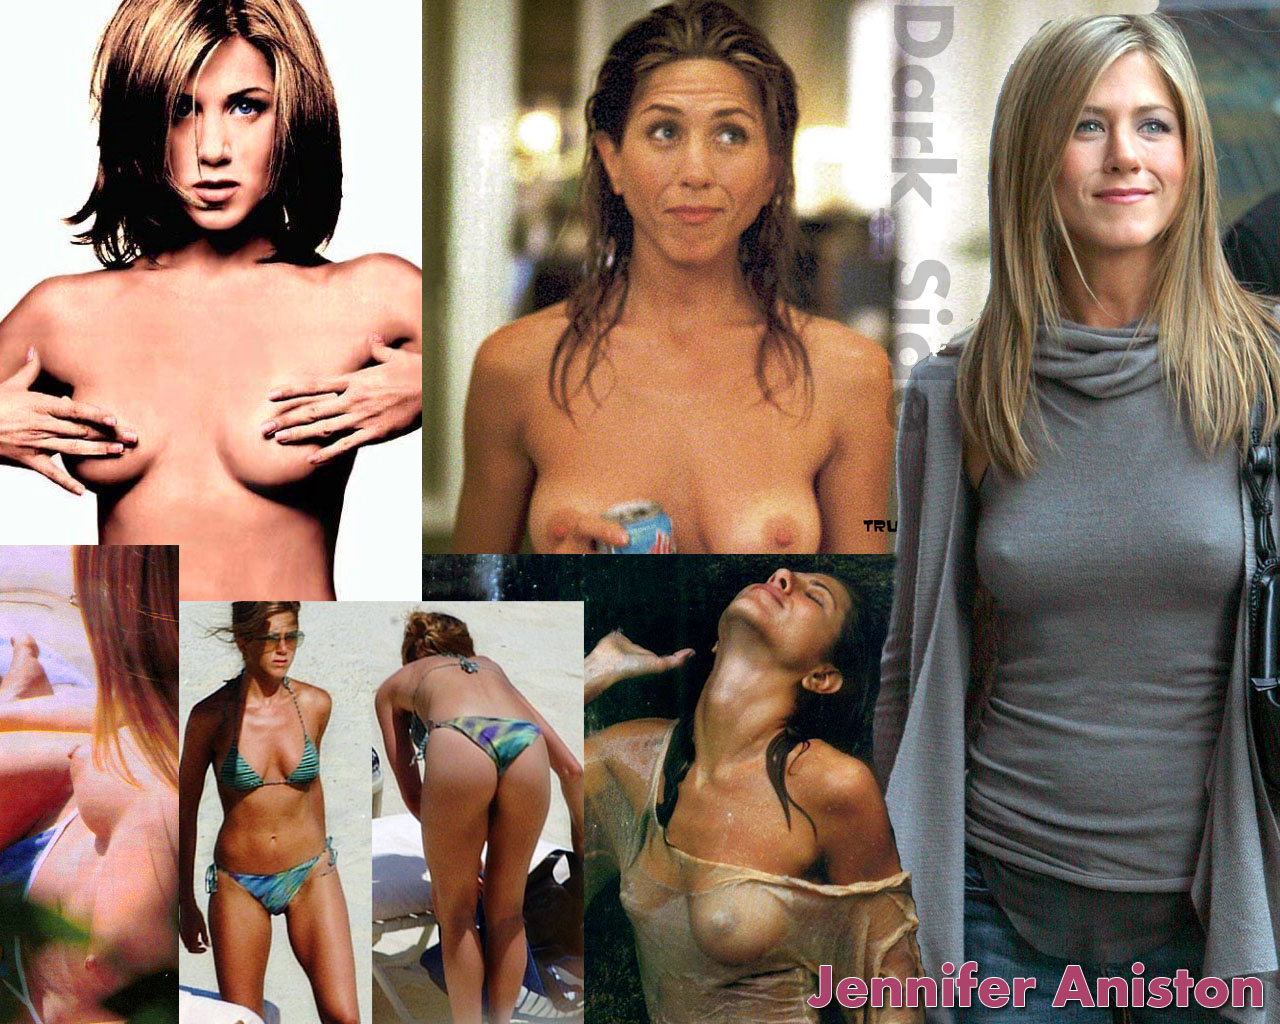 Jennifer aniston with hard nipples sex scene